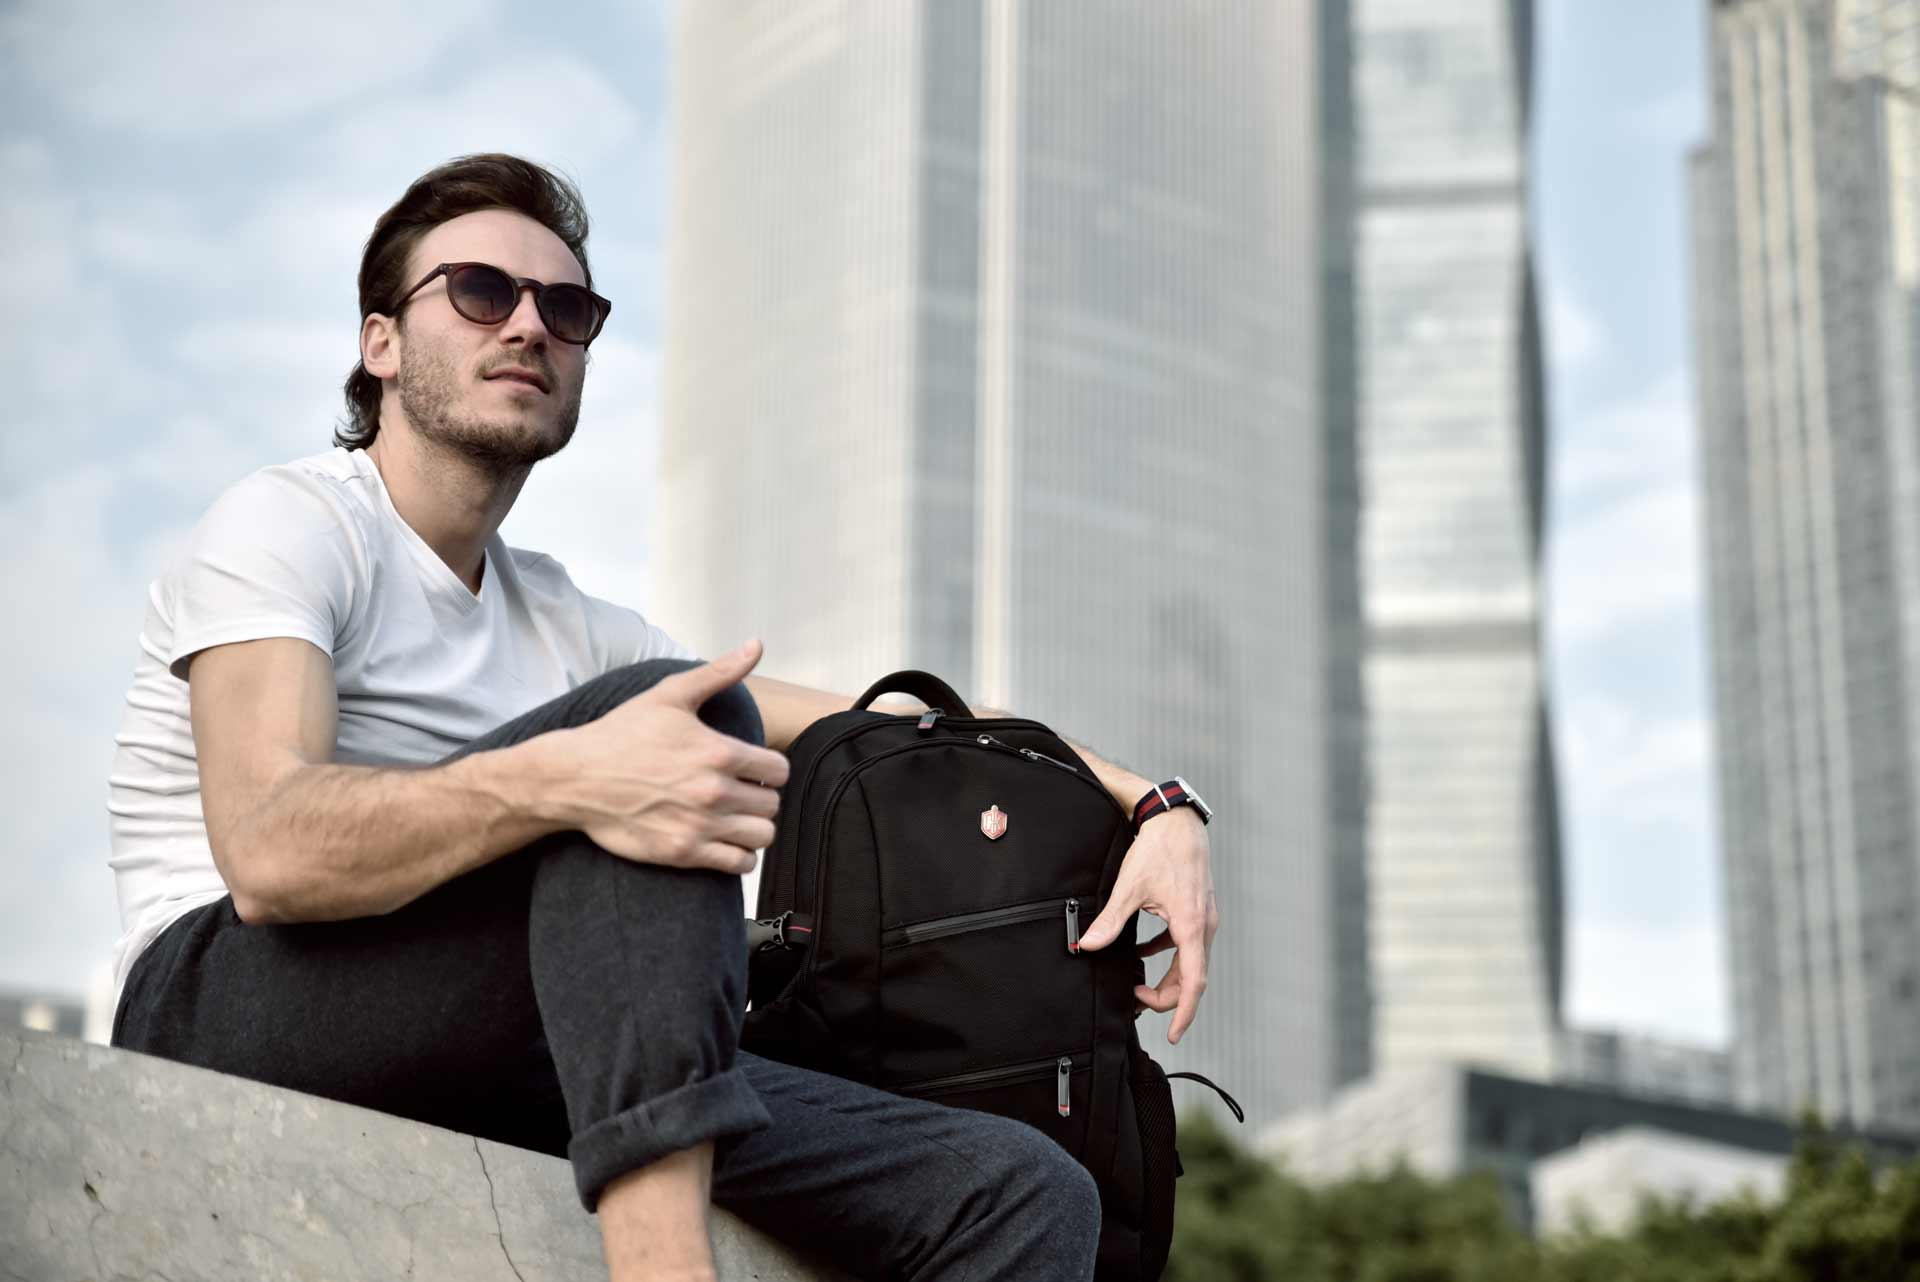 Krimcode Lifestyle Bag - Smart Casual